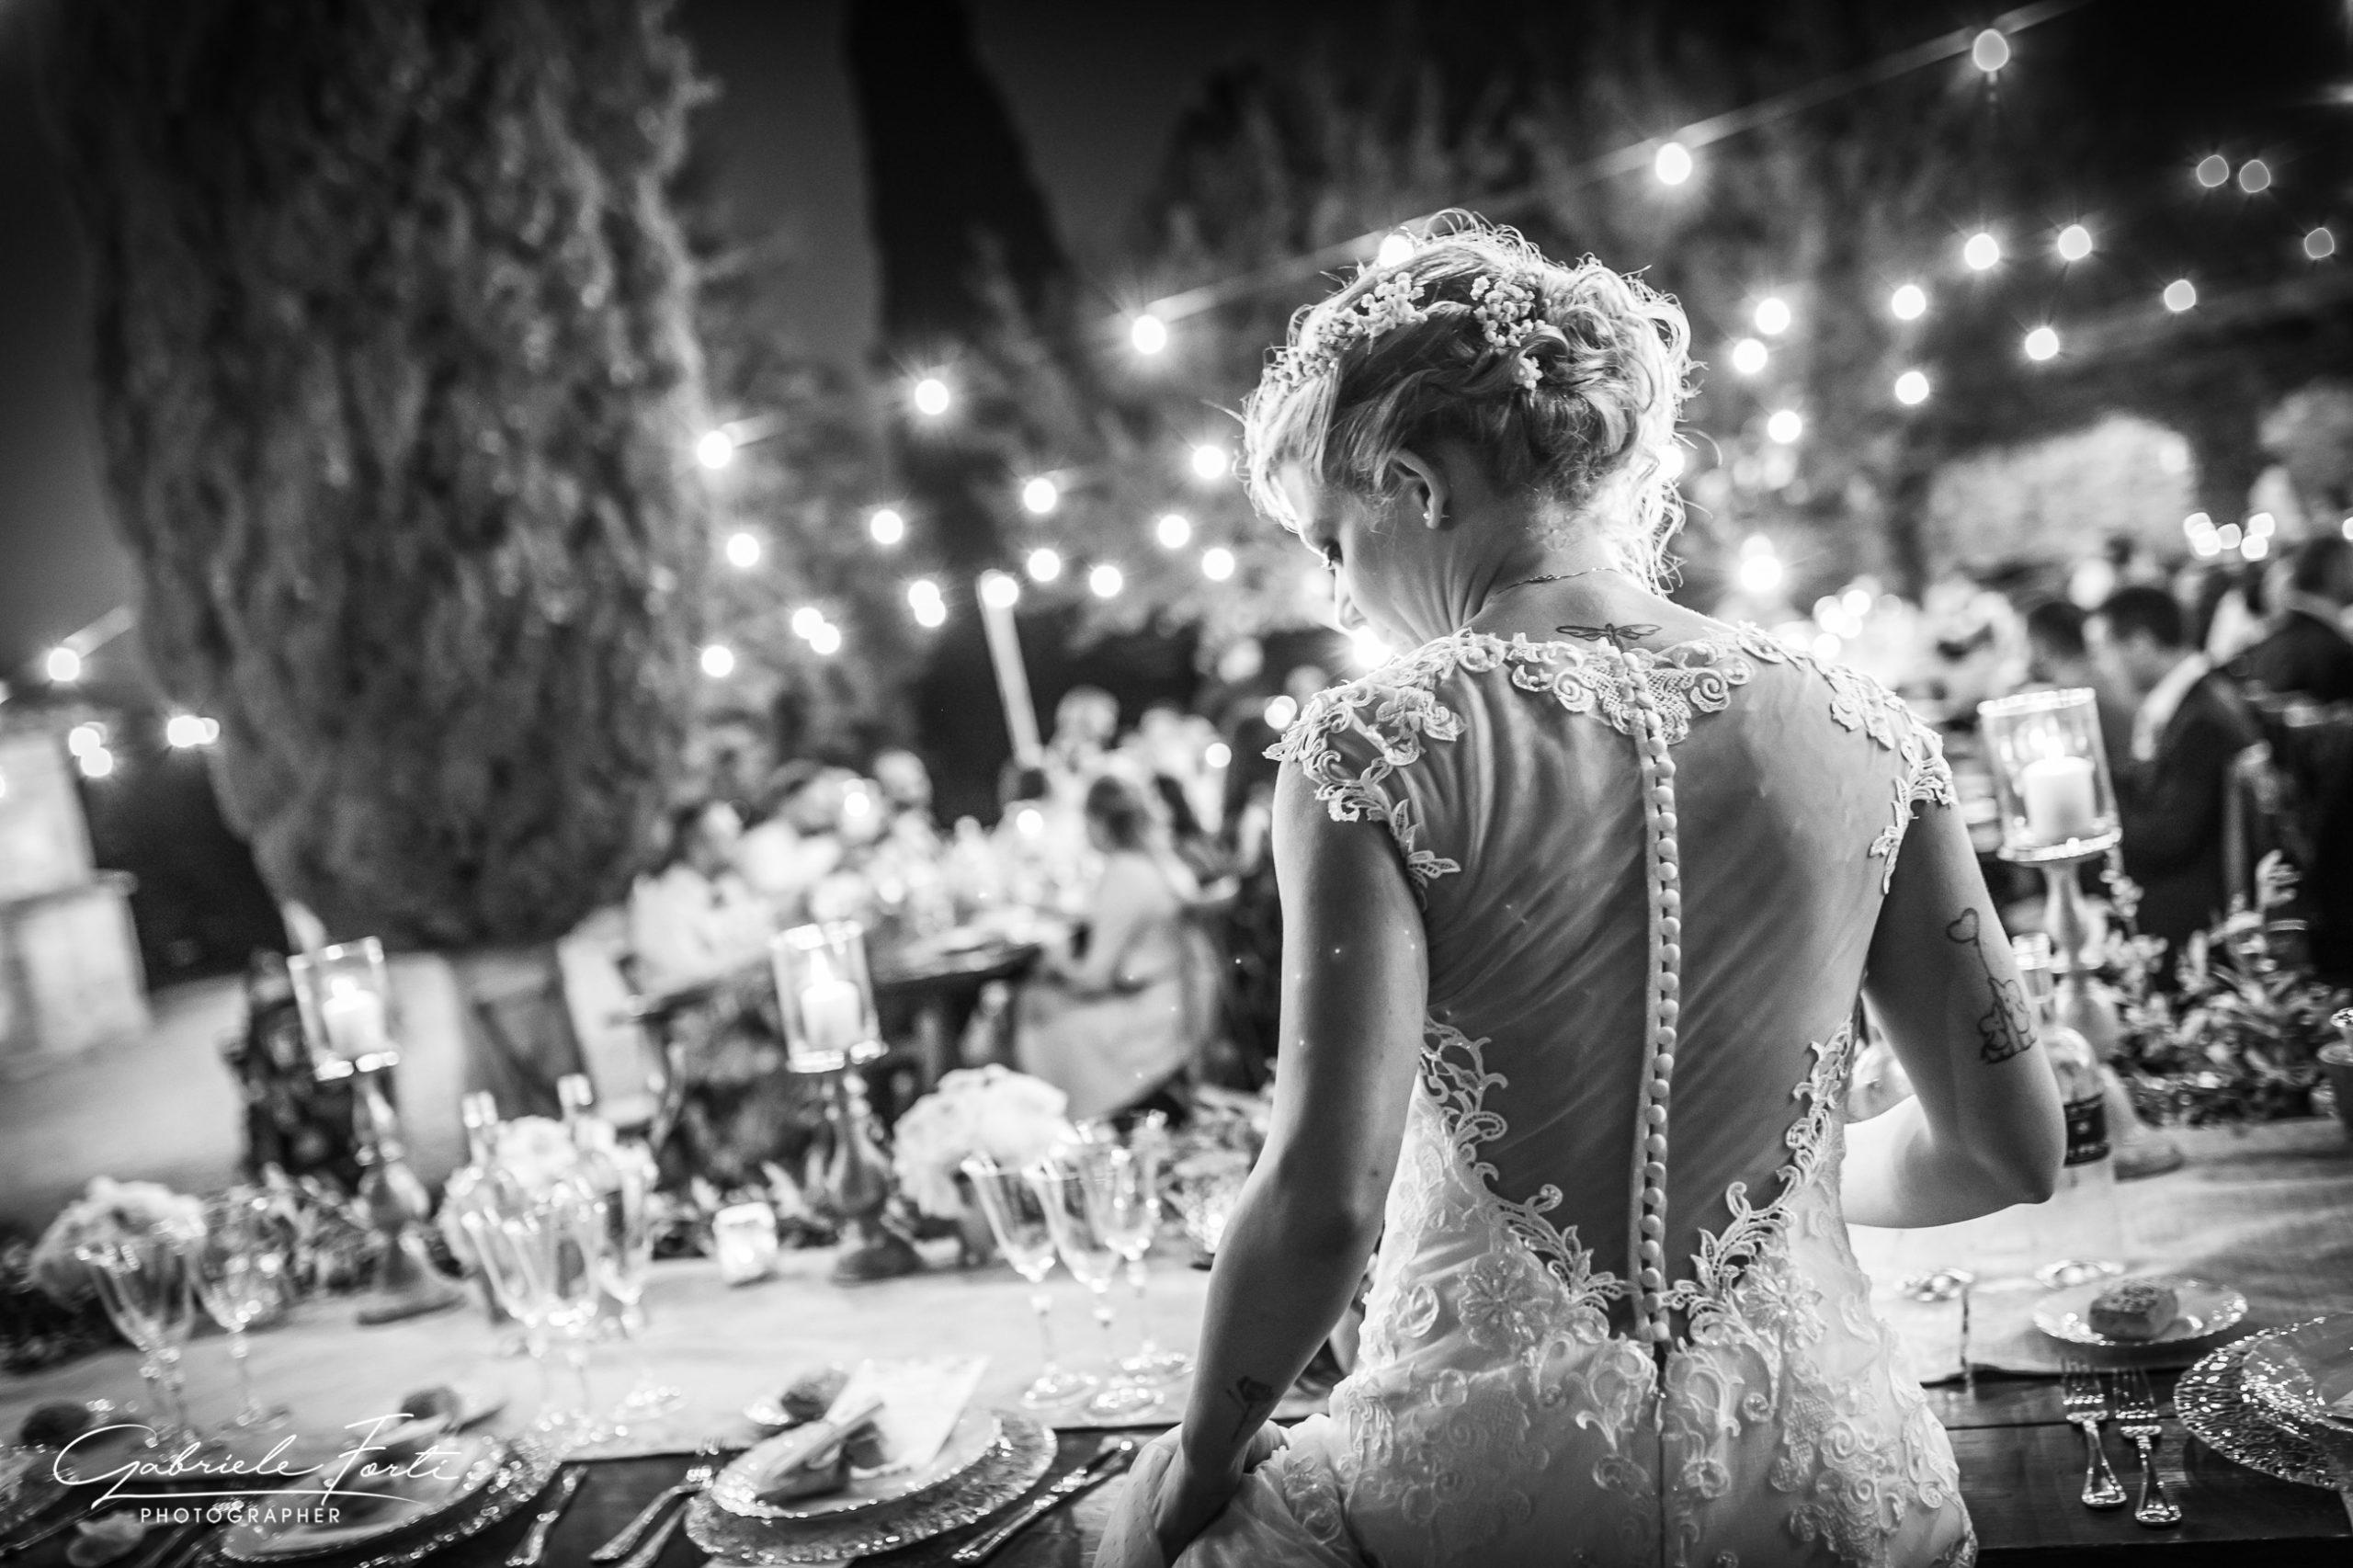 wedding-siena-val-d'orcoa-la-rimbecca-photographer-foto-forti-gabriele-3